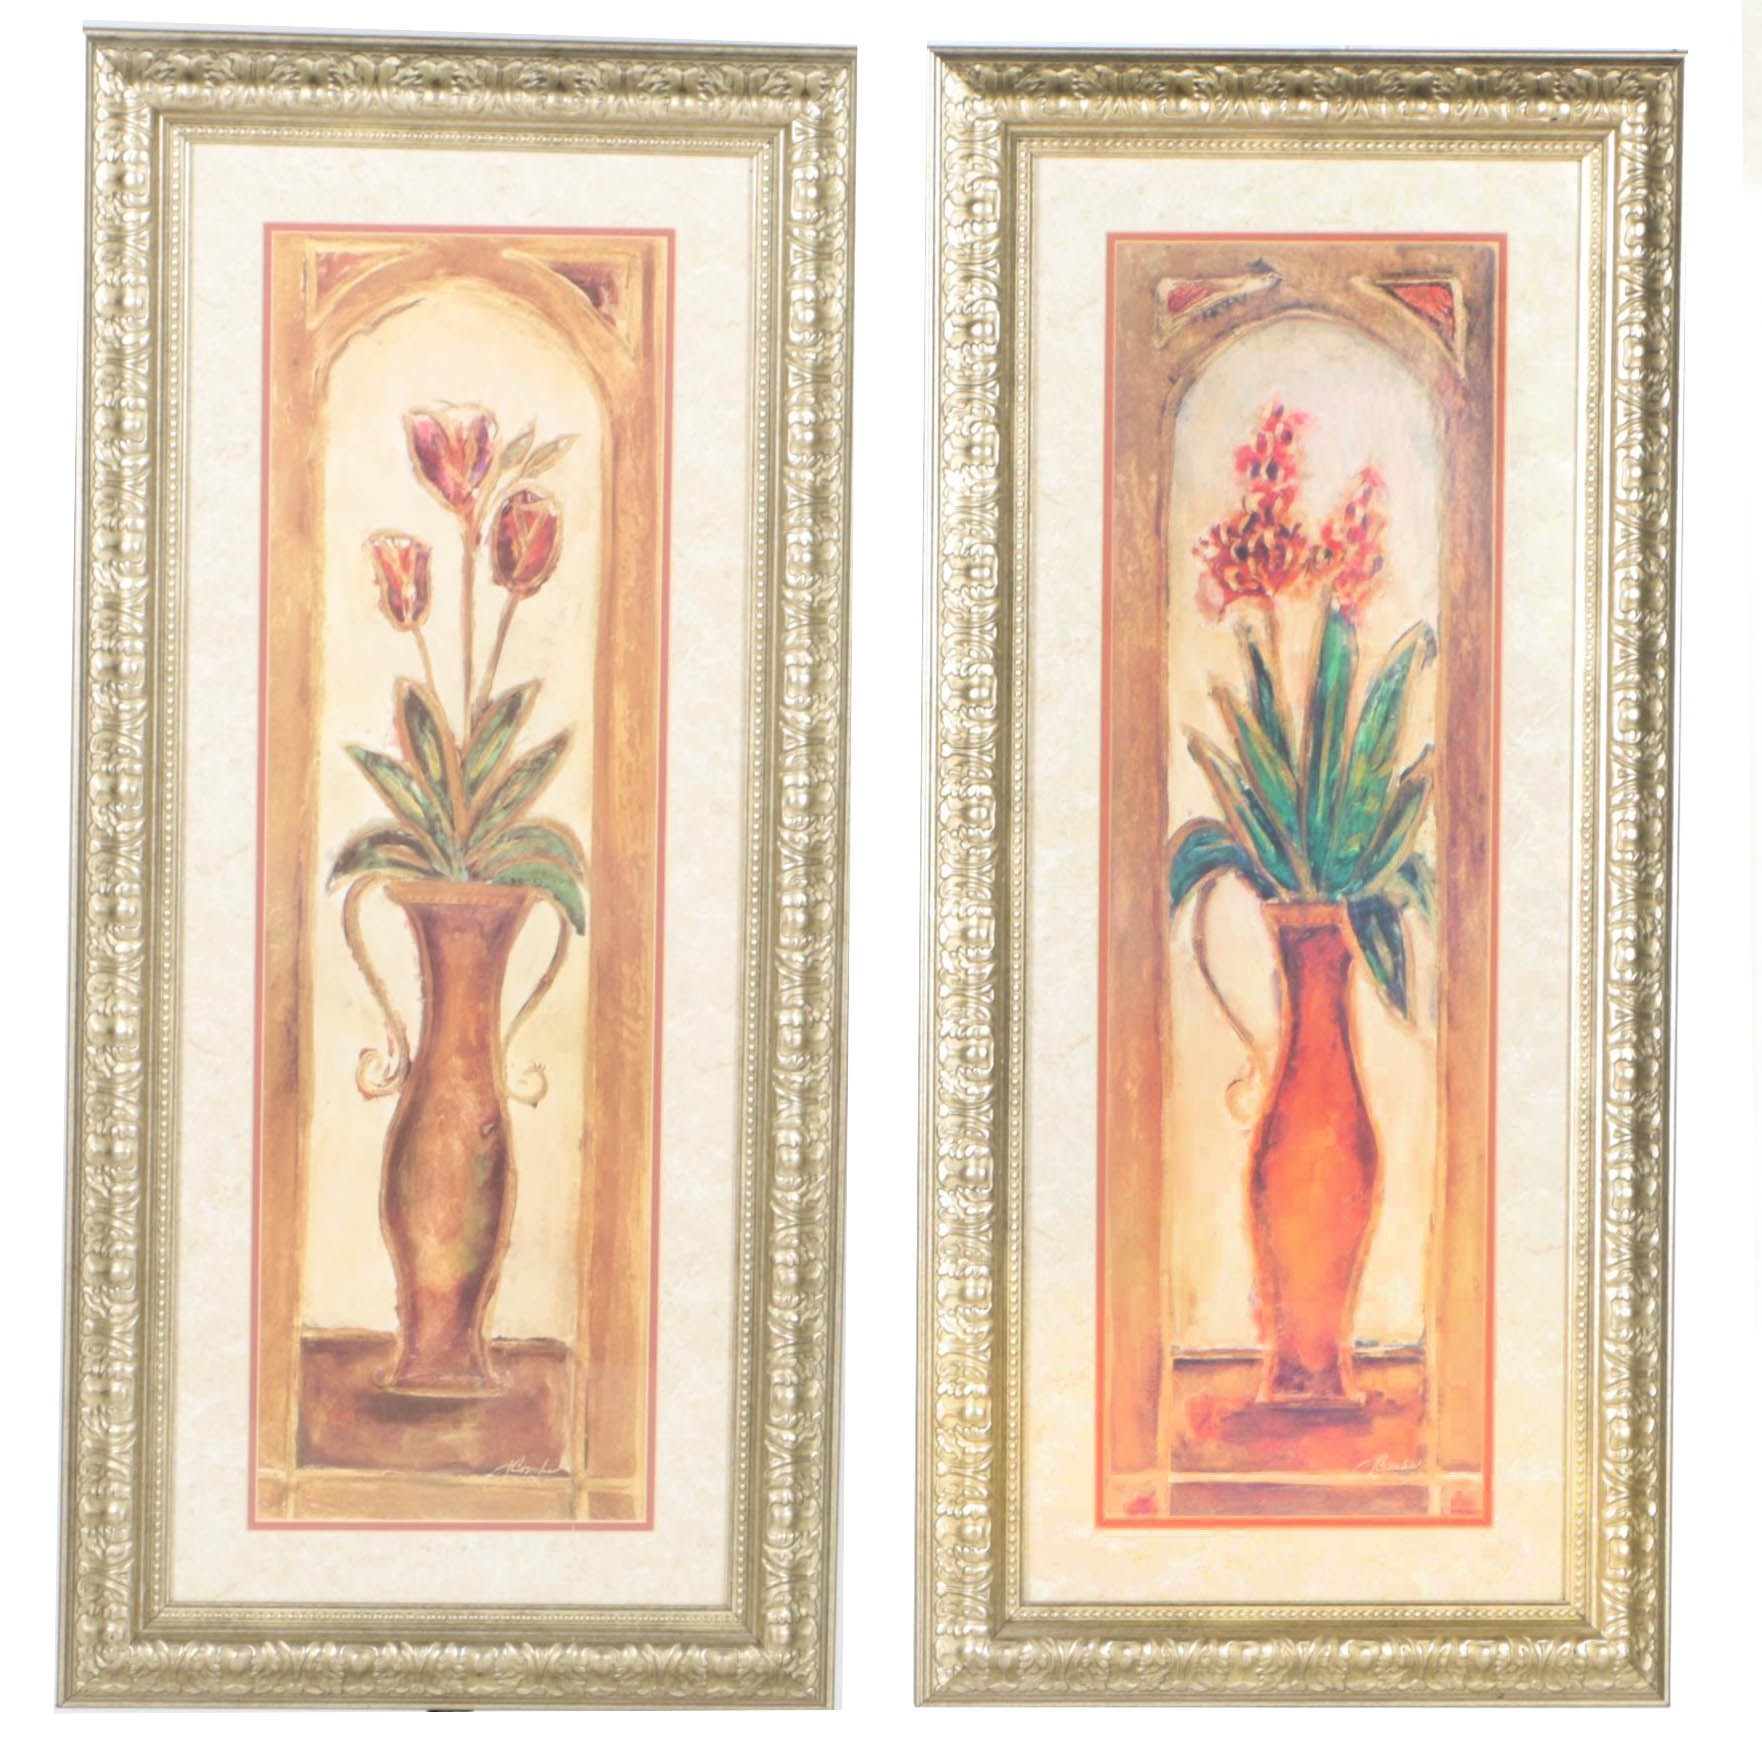 Framed Offset Lithographs of Flowers in Vases